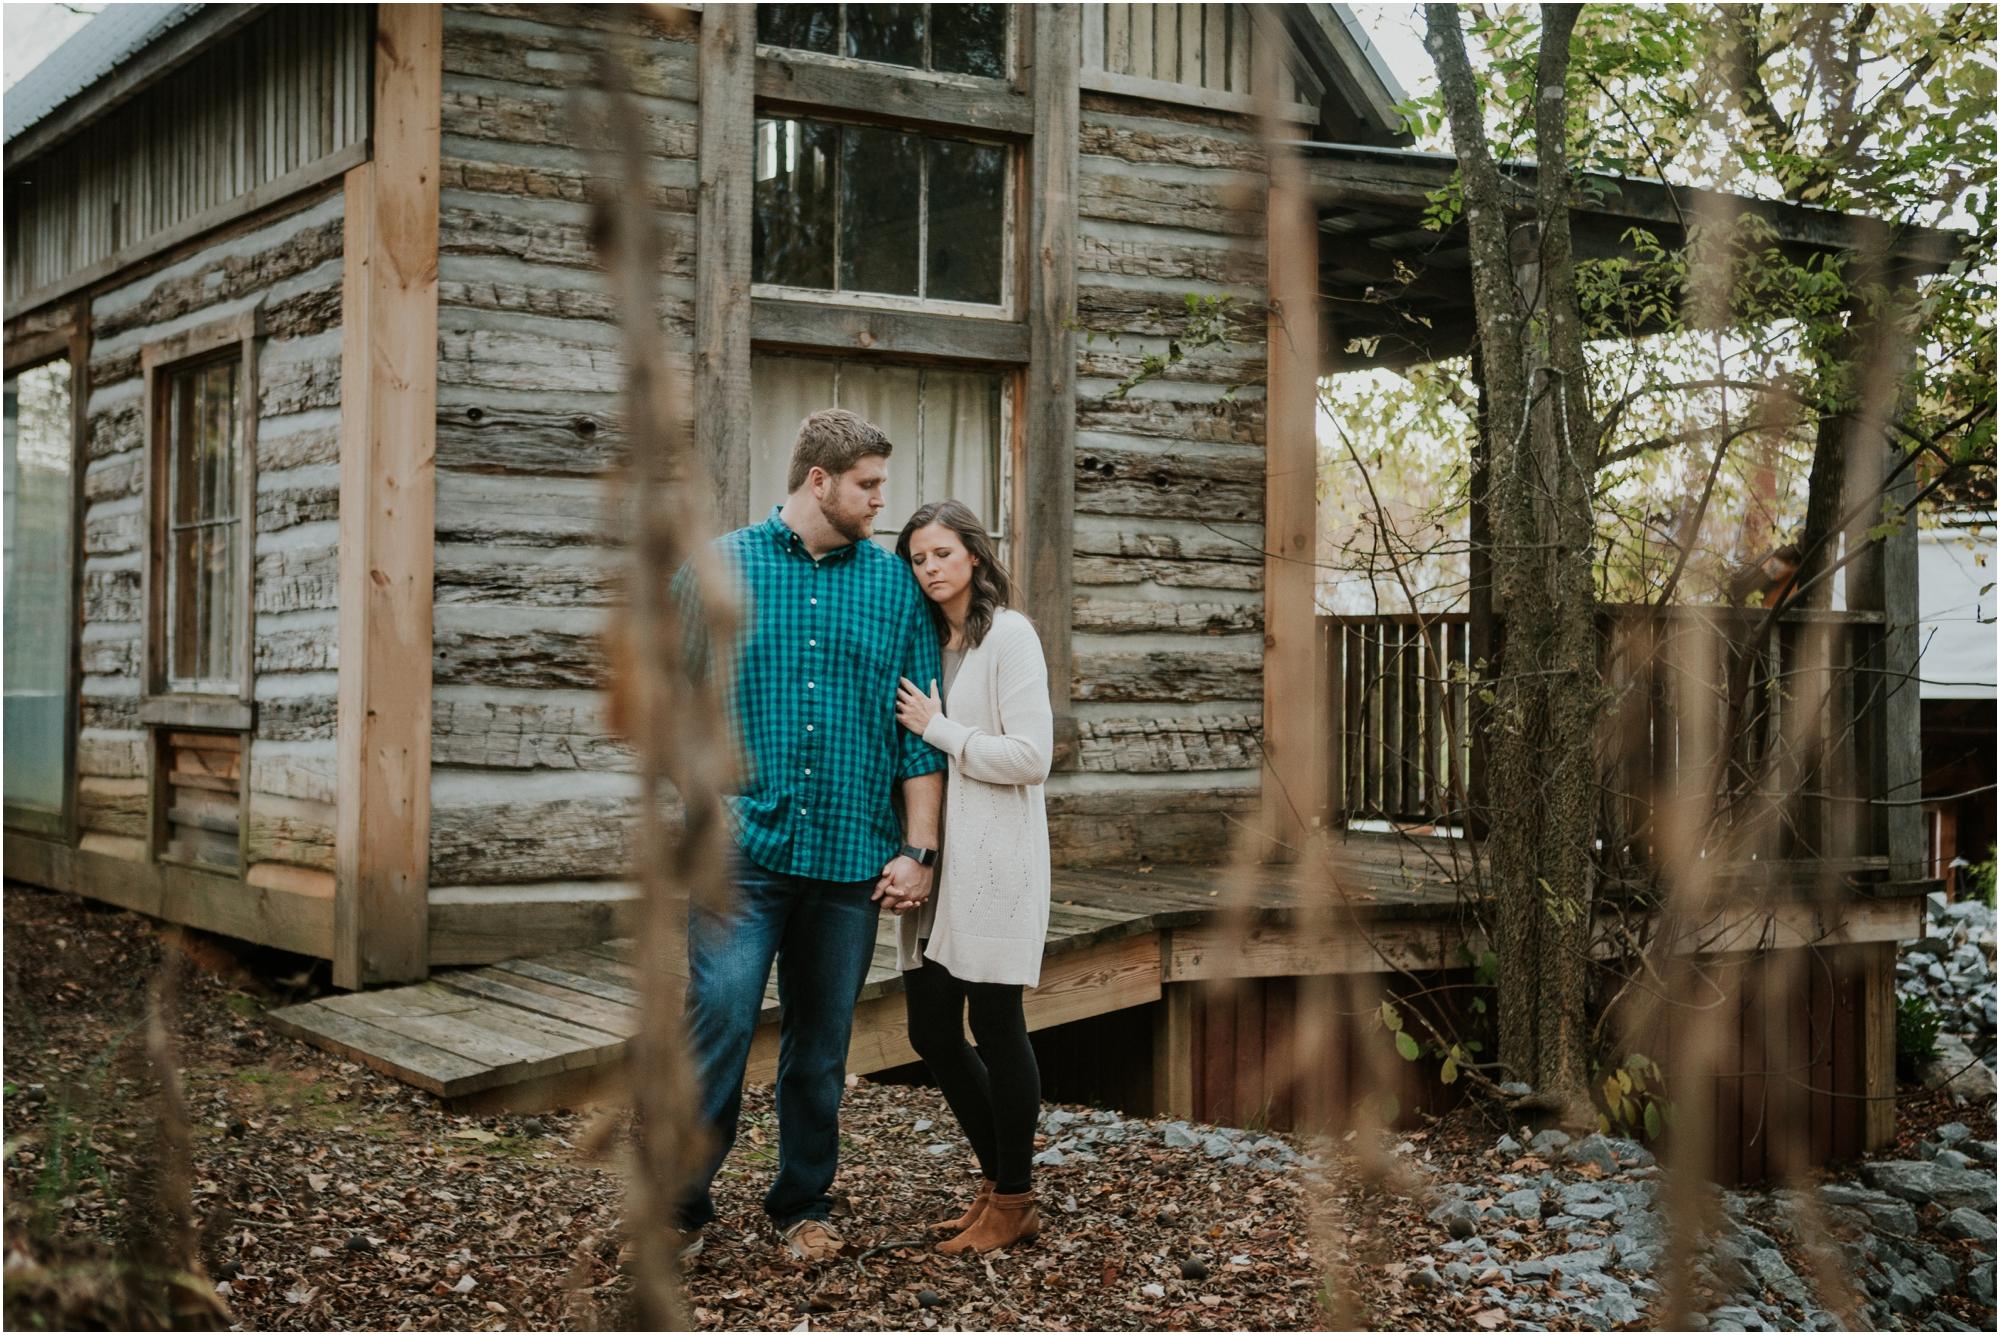 katy-sergent-millstone-limestone-tn-rustic-fall-engagement-session-adventurous-outdoors-intimate-elopement-wedding-northeast-johnson-city-photographer_0032.jpg